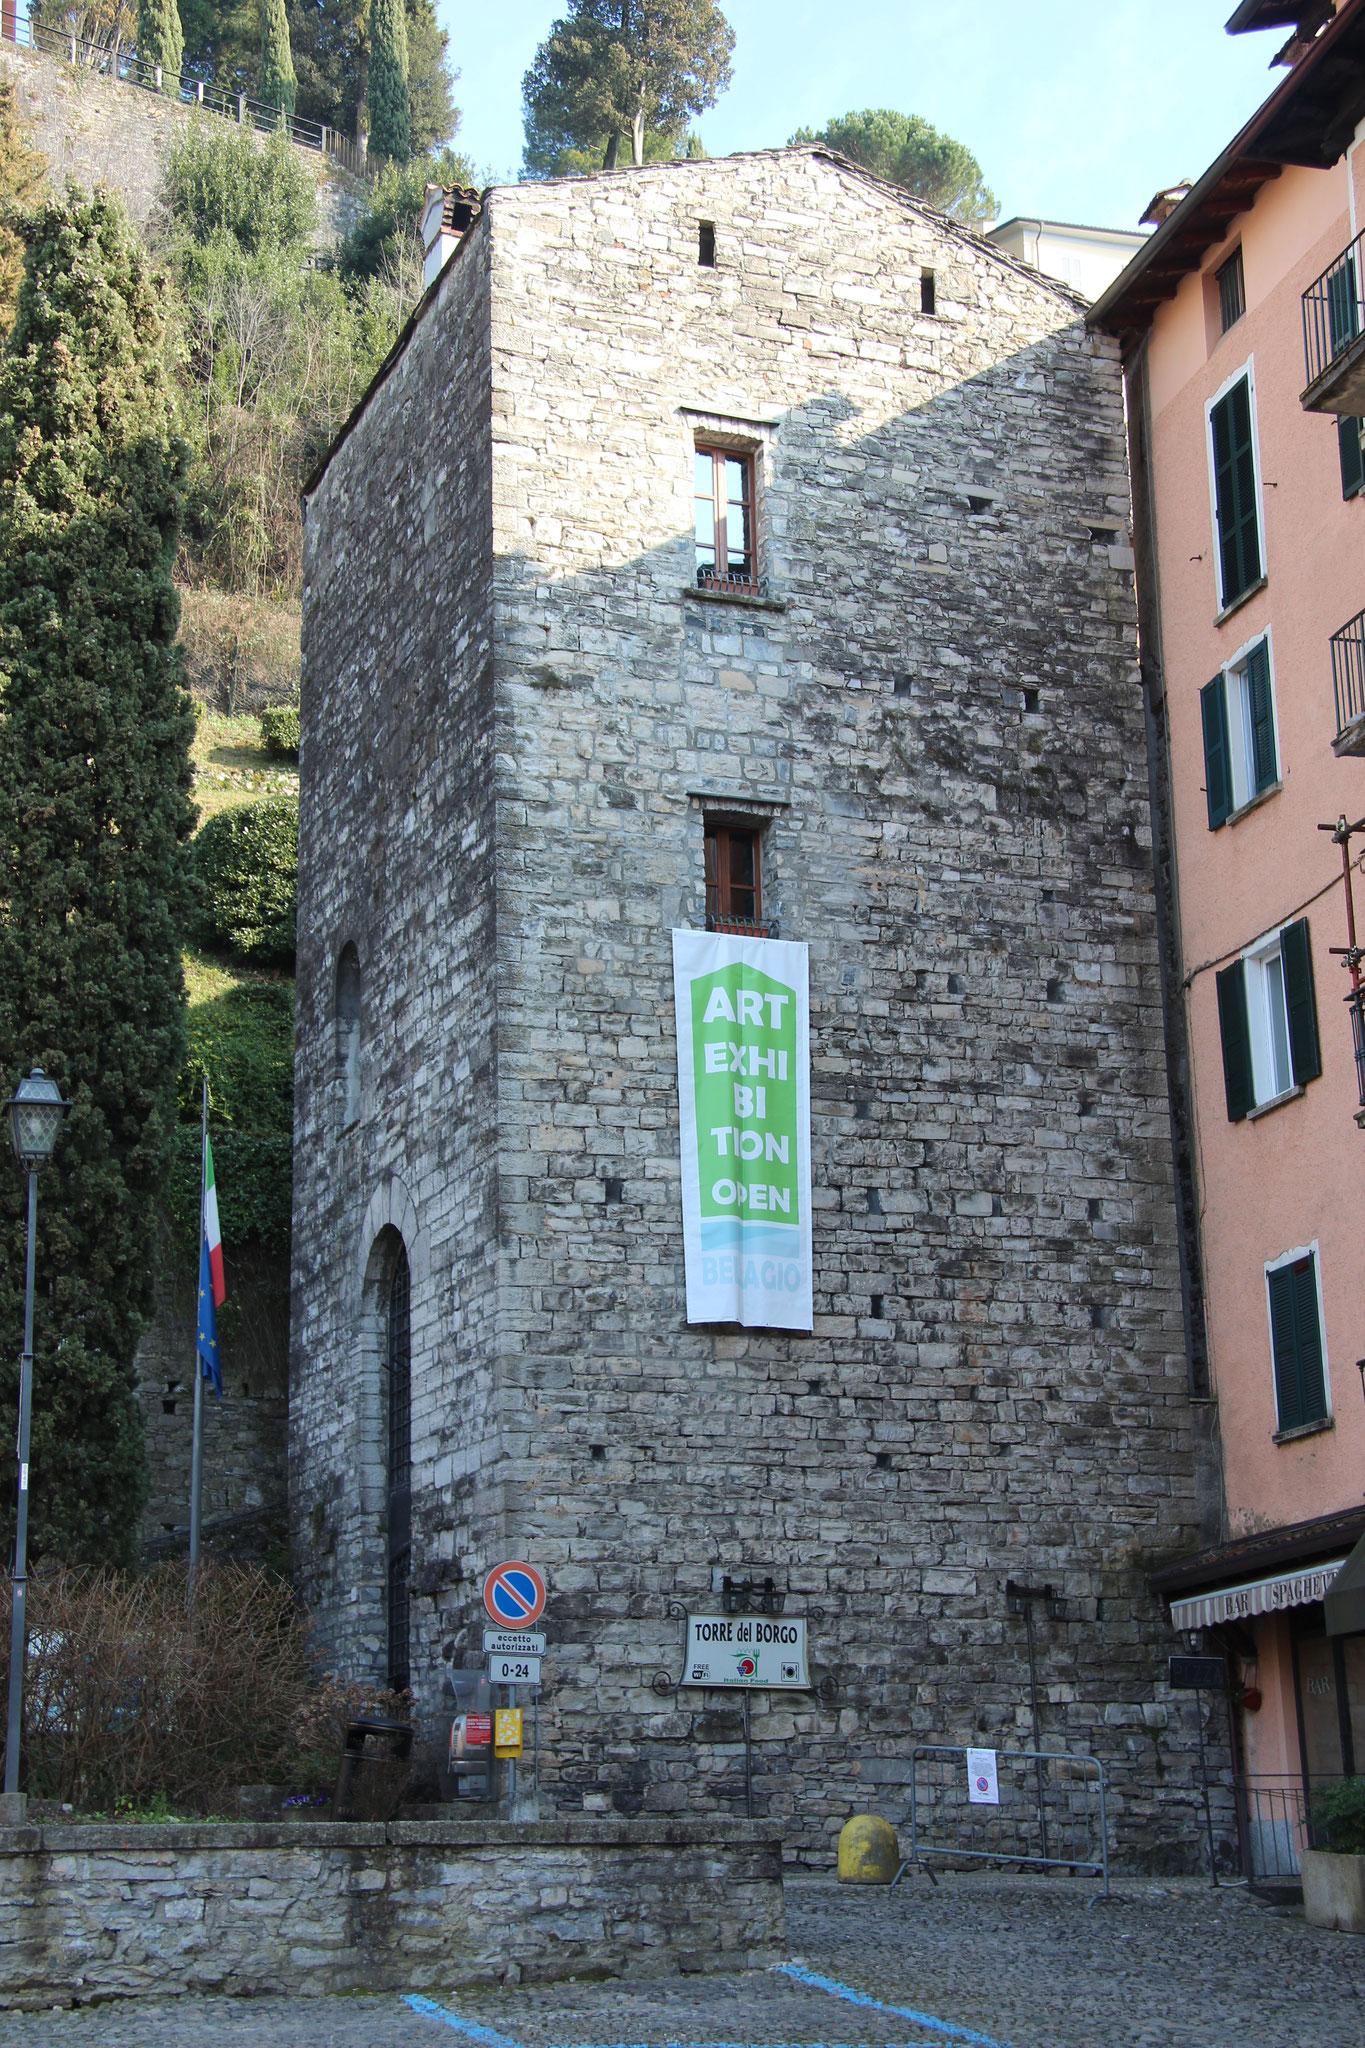 Torre delle Arti, Bellagio - franzRoom.net